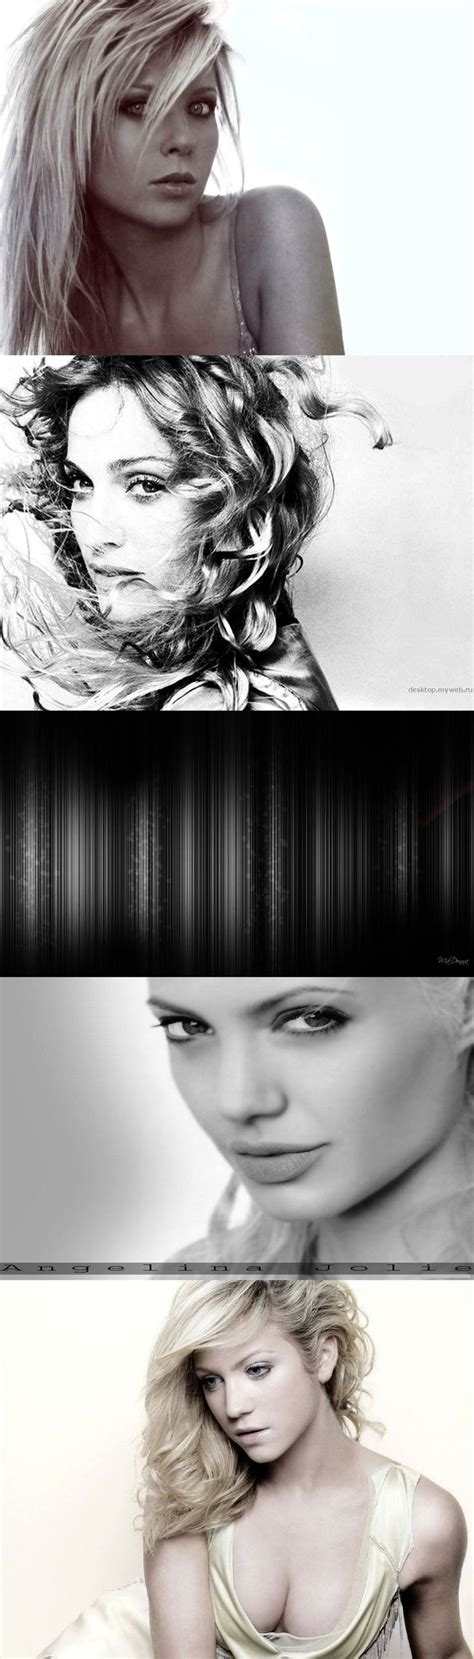 Britanny Snow Black And White Black And White Background